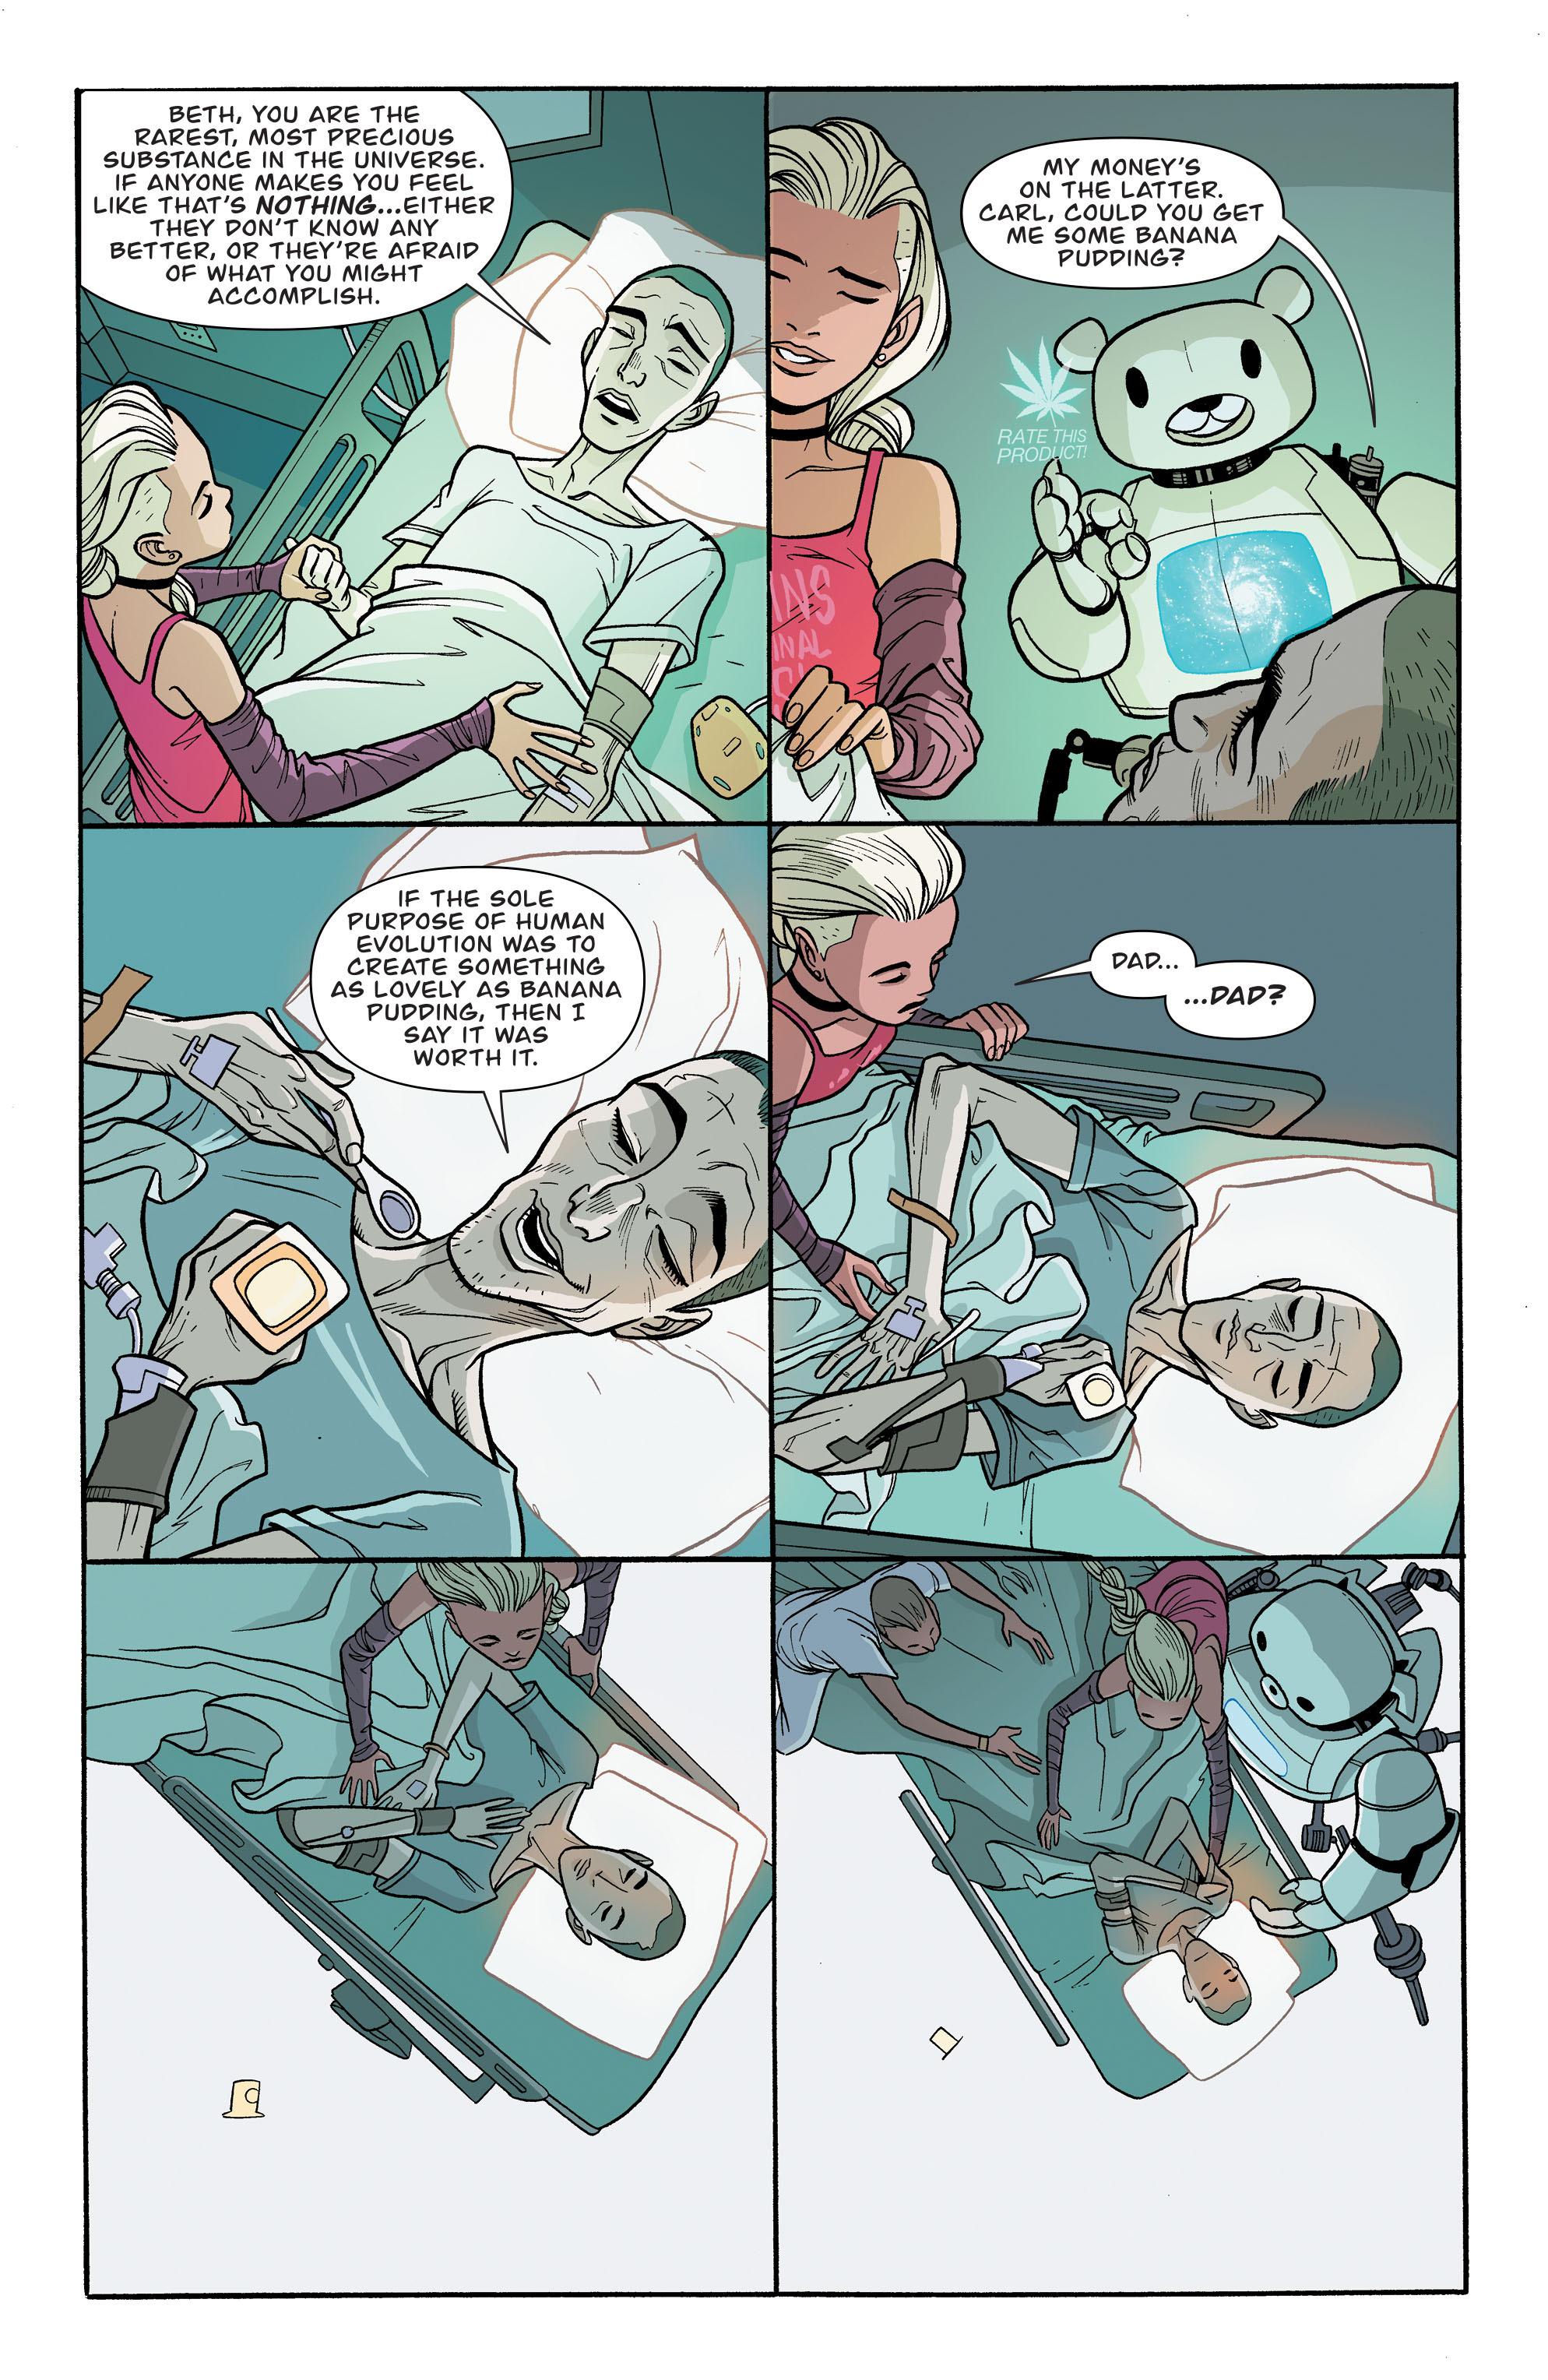 New review for DC Comics Prez #2